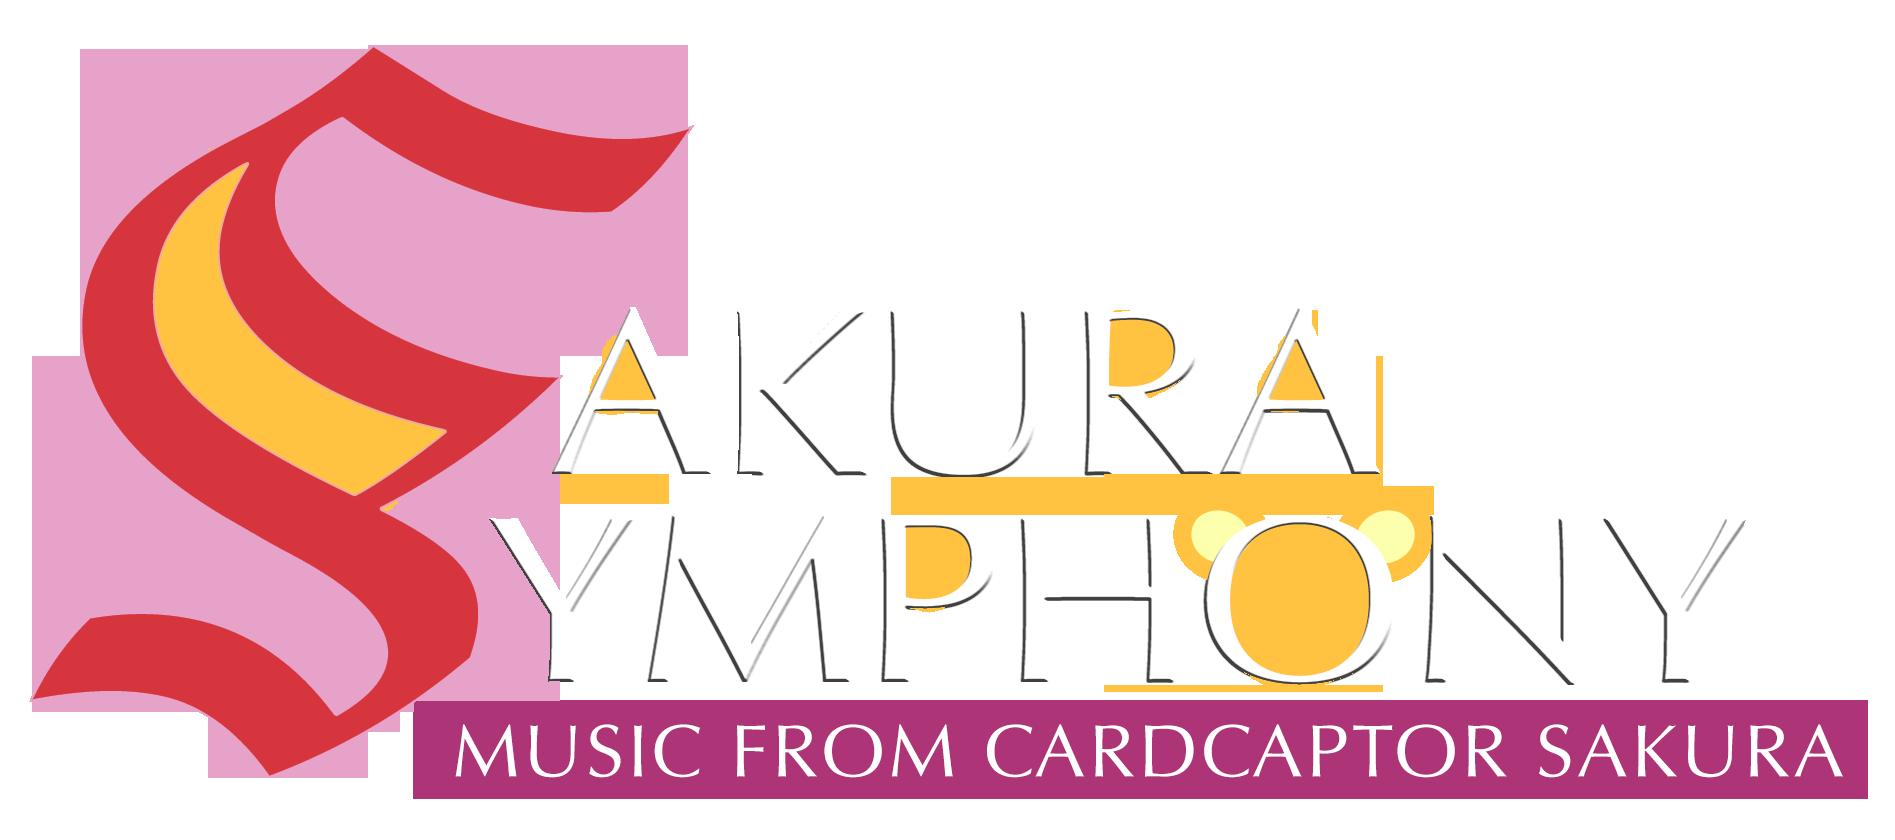 Sakura Symphony: Music of Cardcaptor Sakura